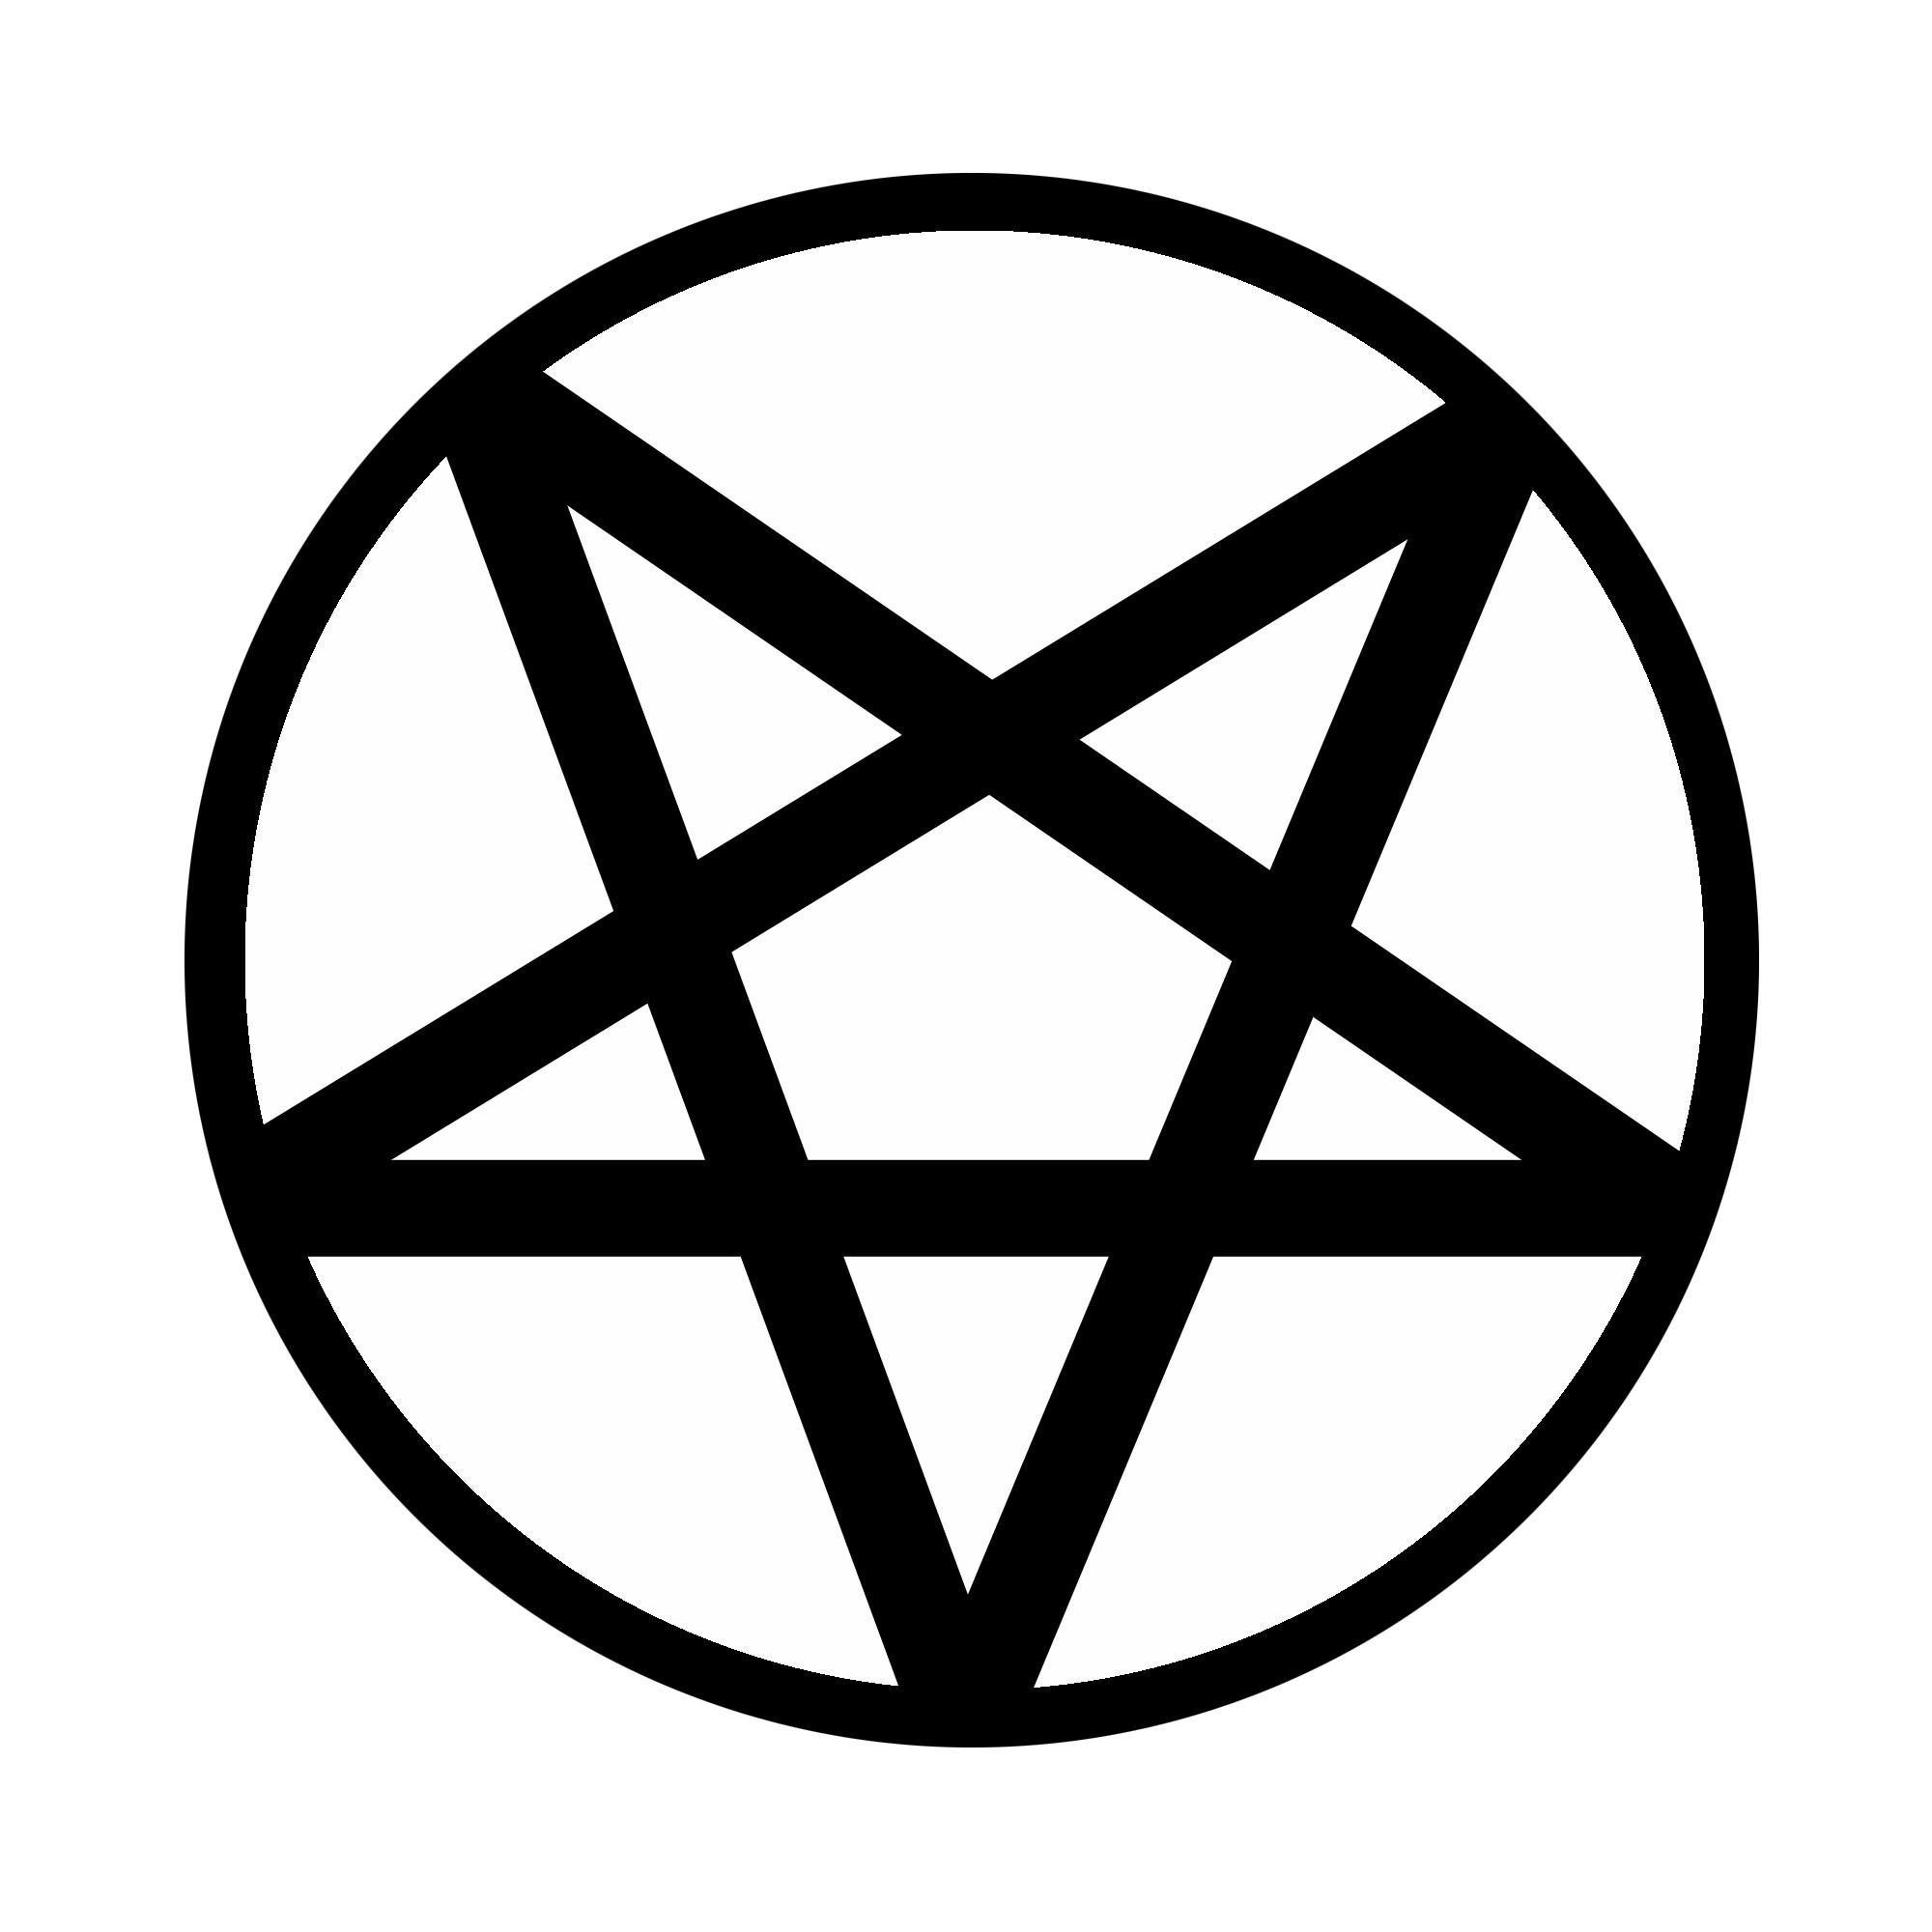 Res: 2000x2000, PSD by Gothguy720 pentagram .PSD by Gothguy720